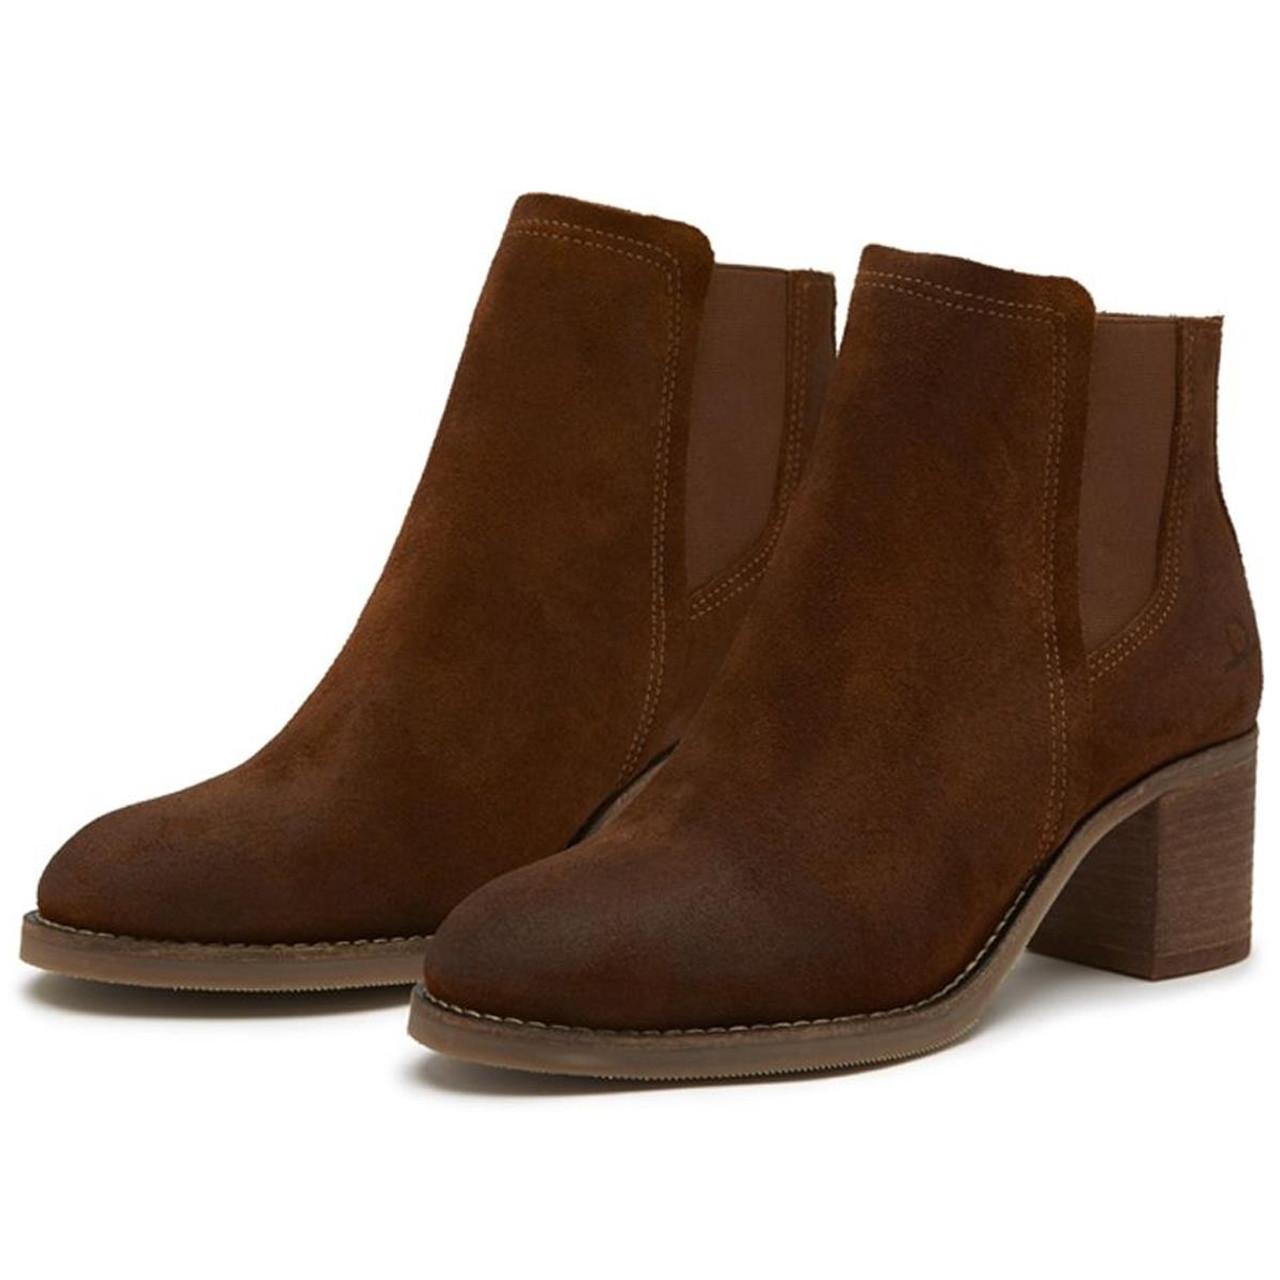 Chatham Womens Savannah Chelsea Boots